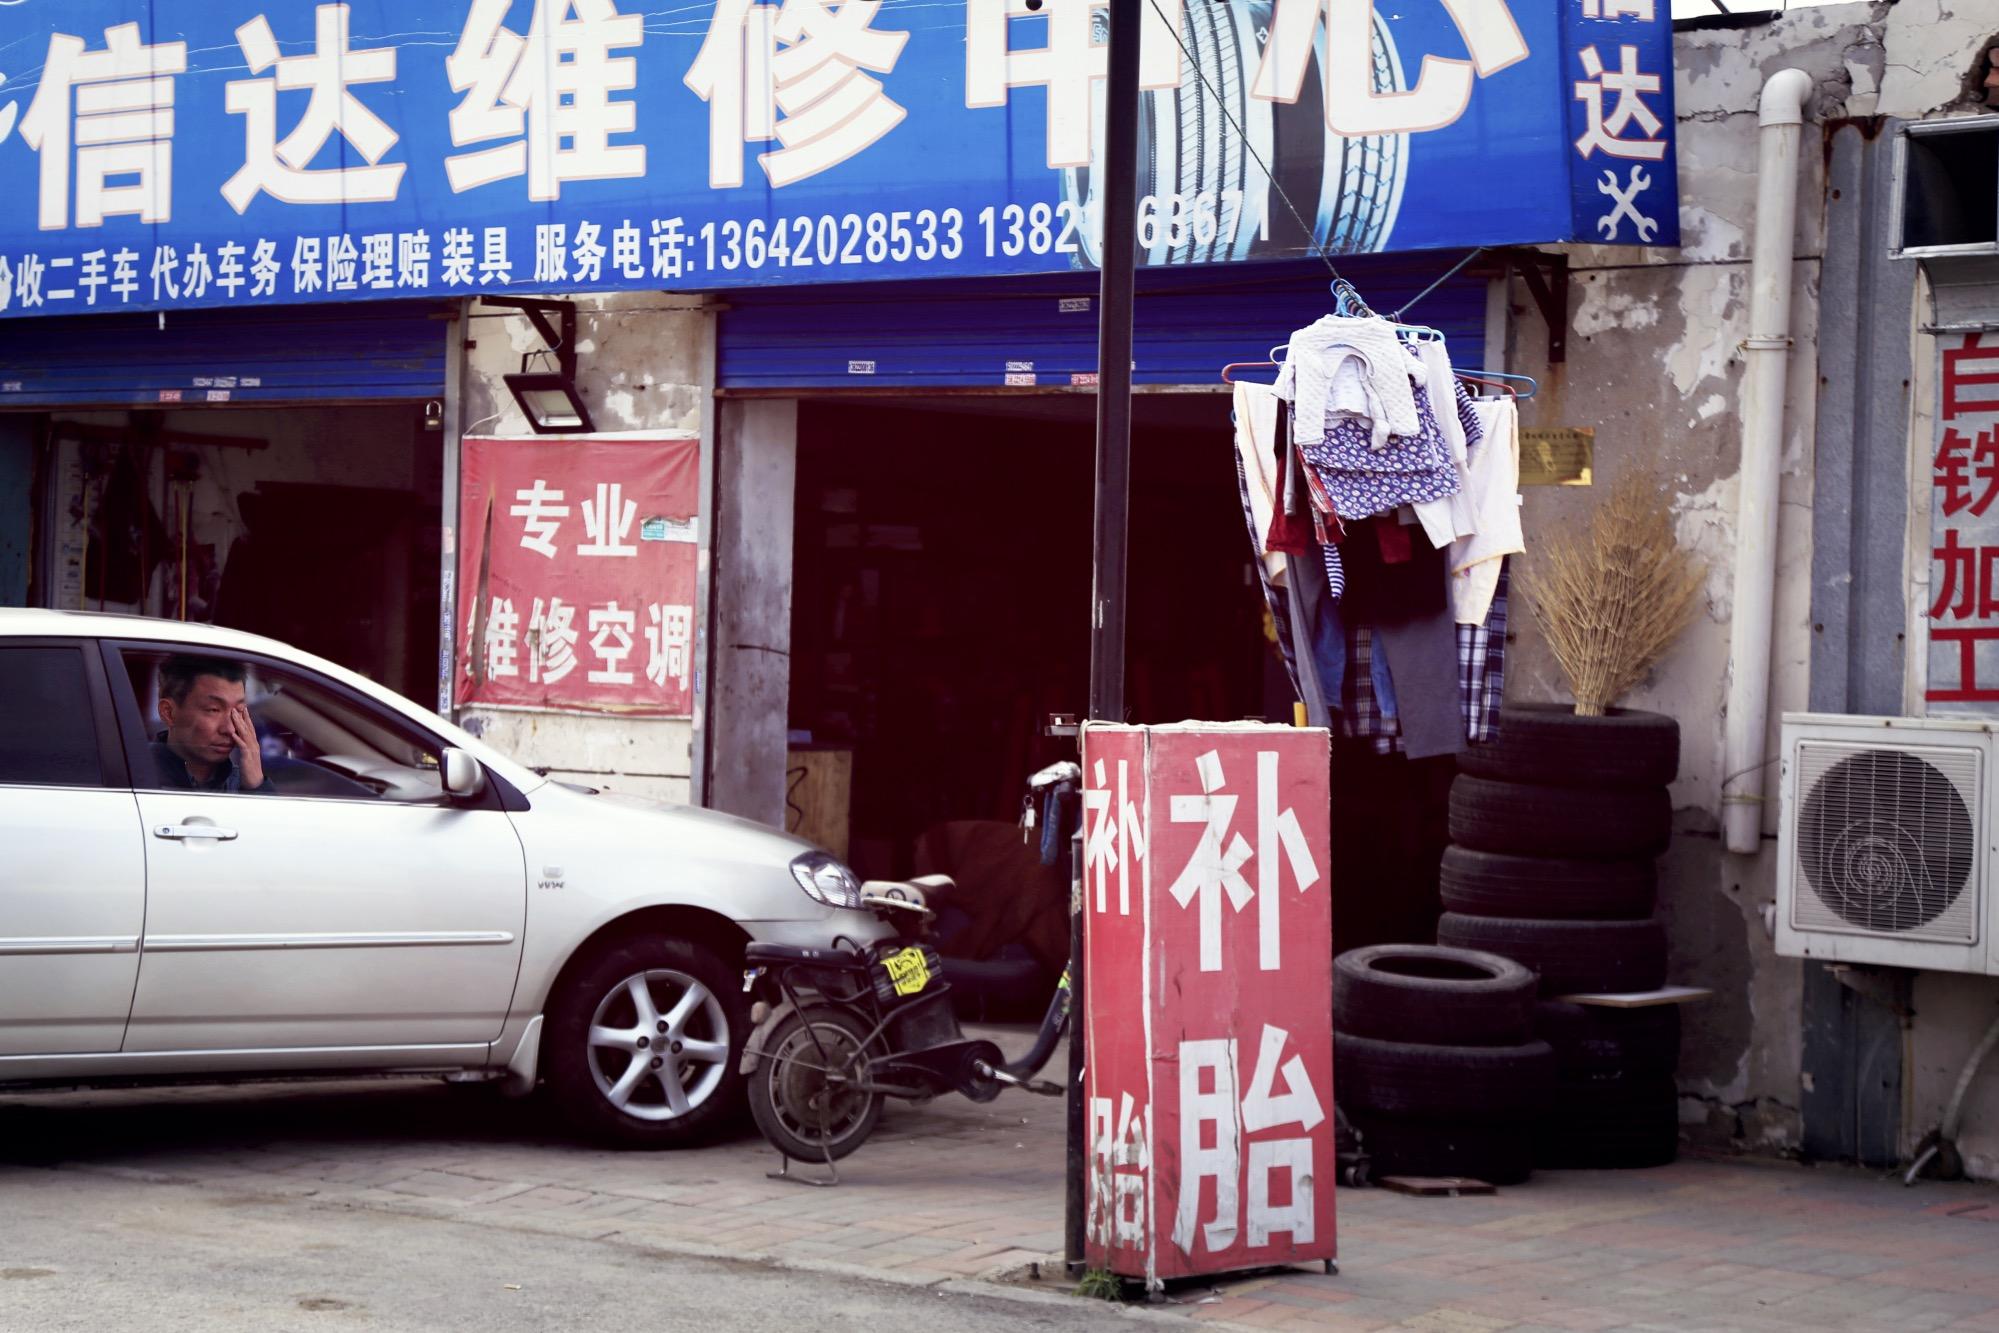 China_2016_Jarek_Raczek_WEB_19